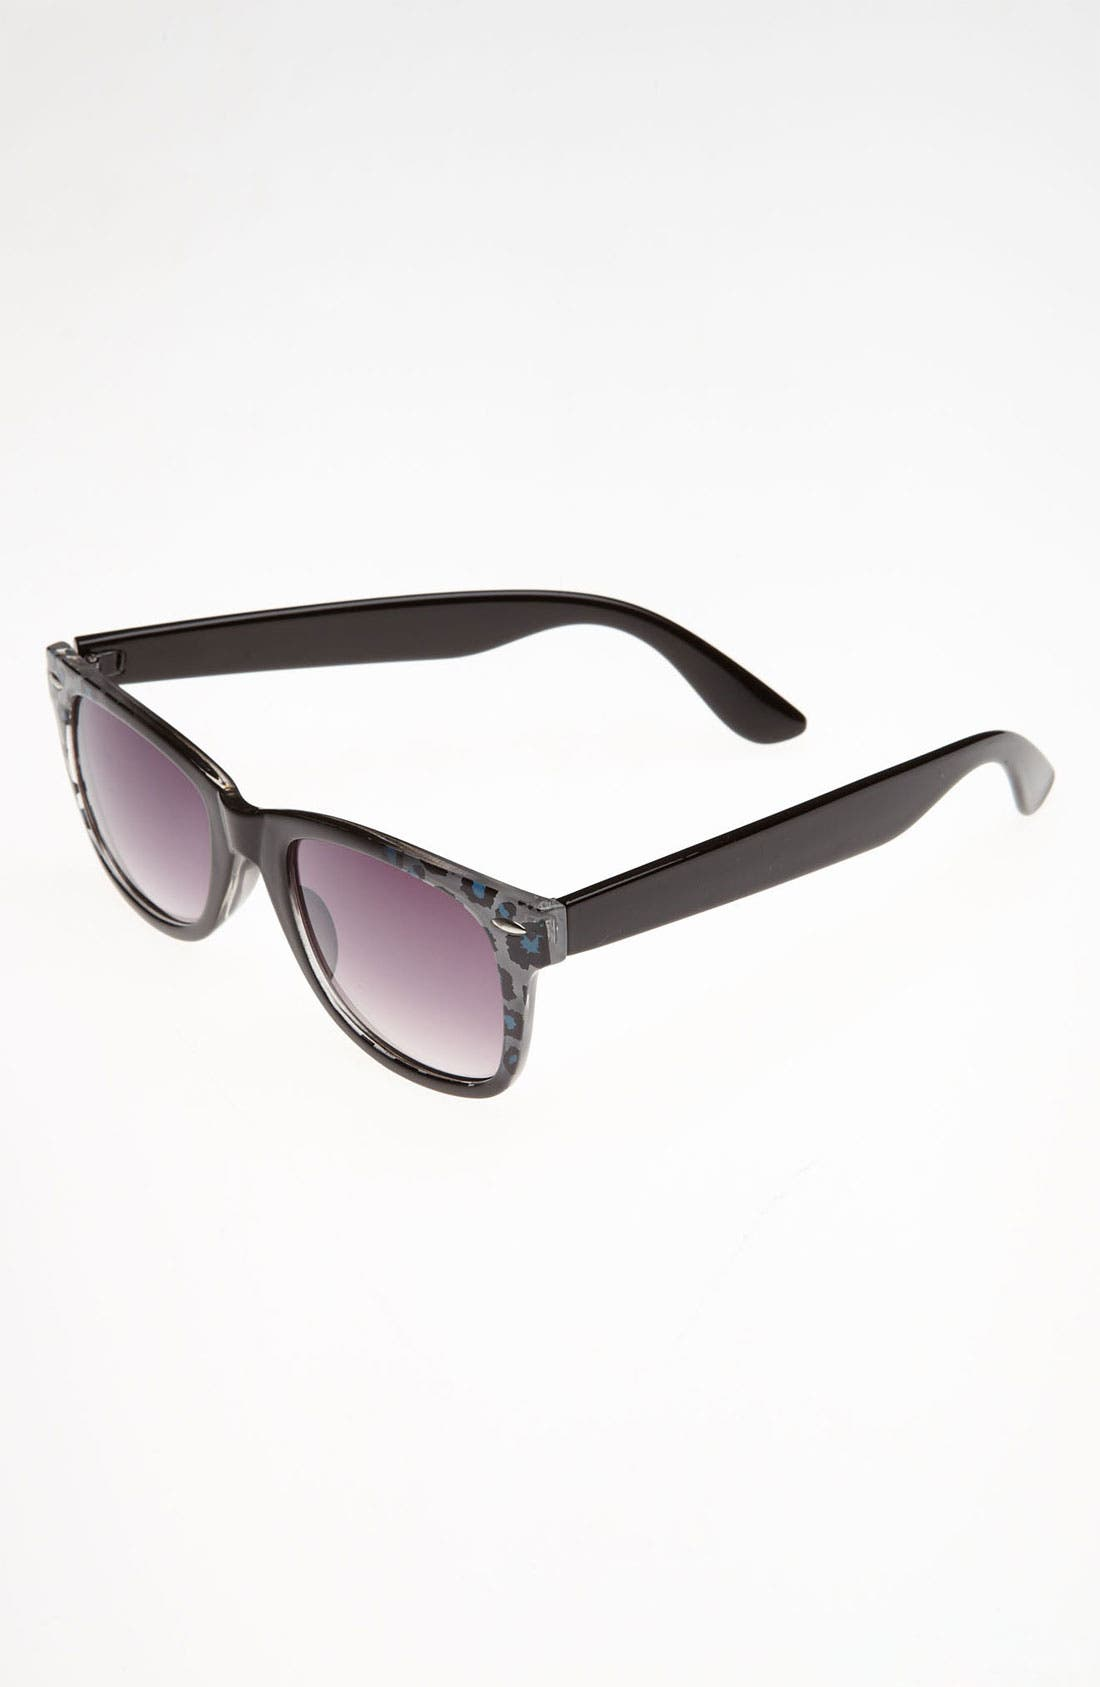 Alternate Image 1 Selected - Icon Eyewear 'Leopard' Sunglasses (Girls)